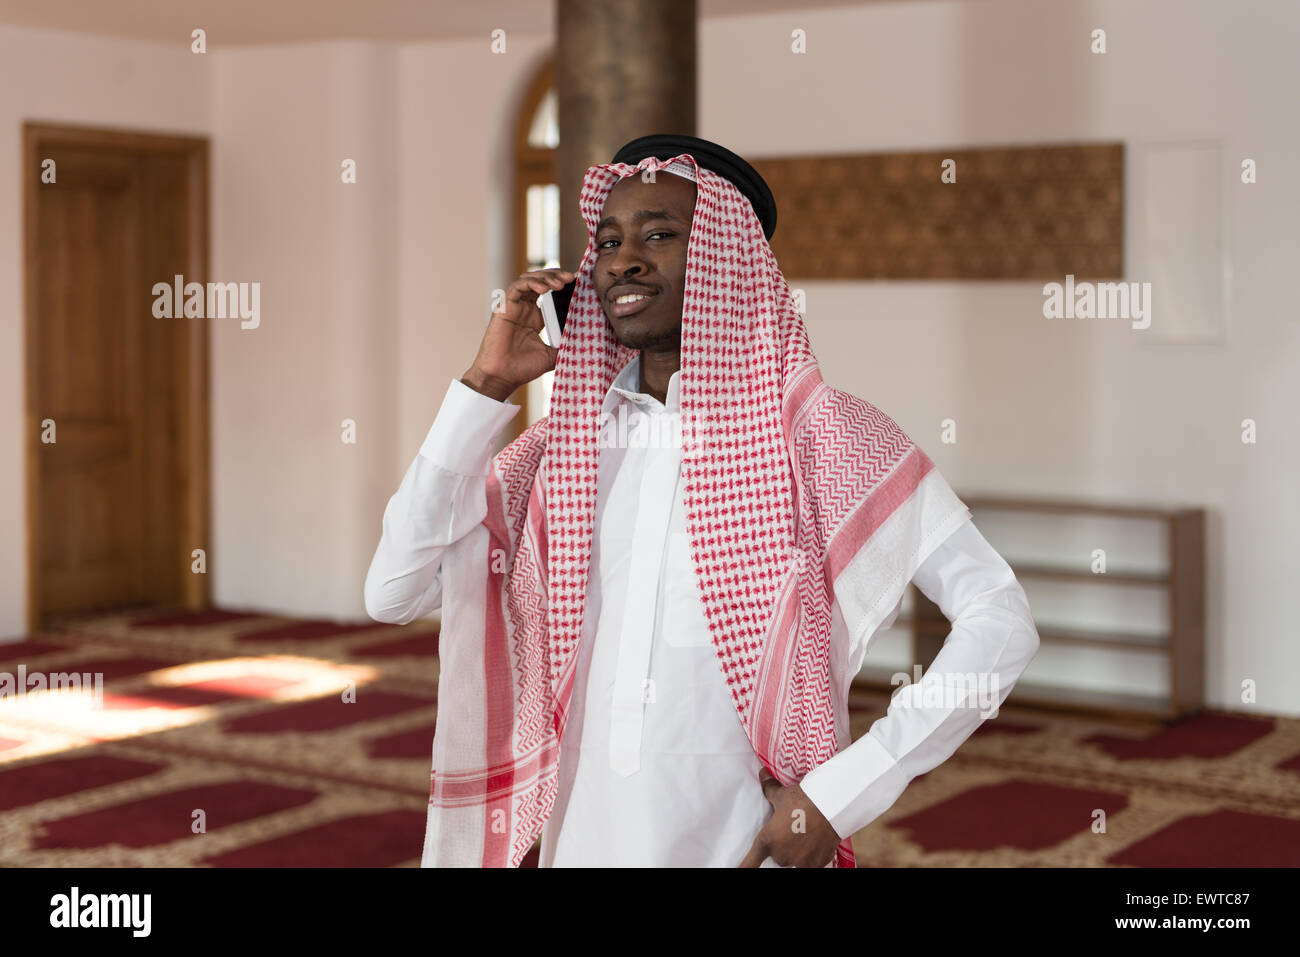 Arab Saudi Emirates Man Using A Smart Phone - Stock Image